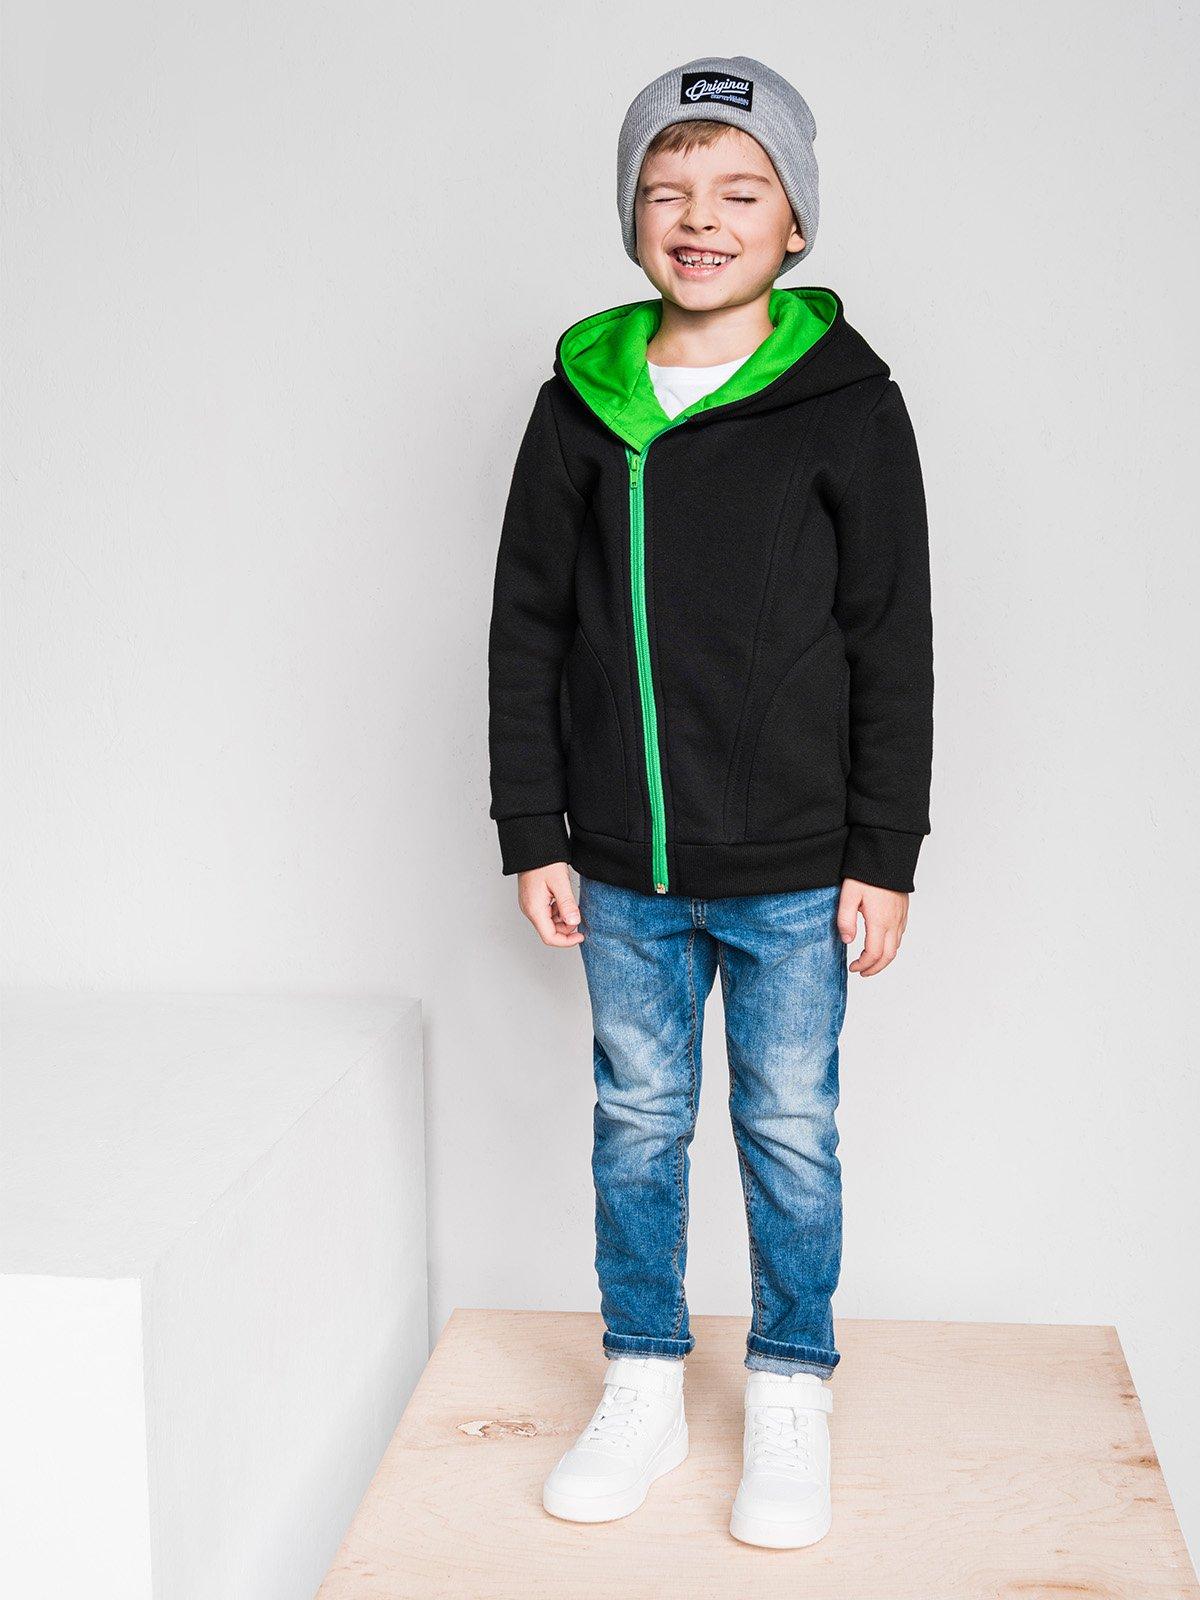 Bluza Kb001 Kids - Czarna/zielona